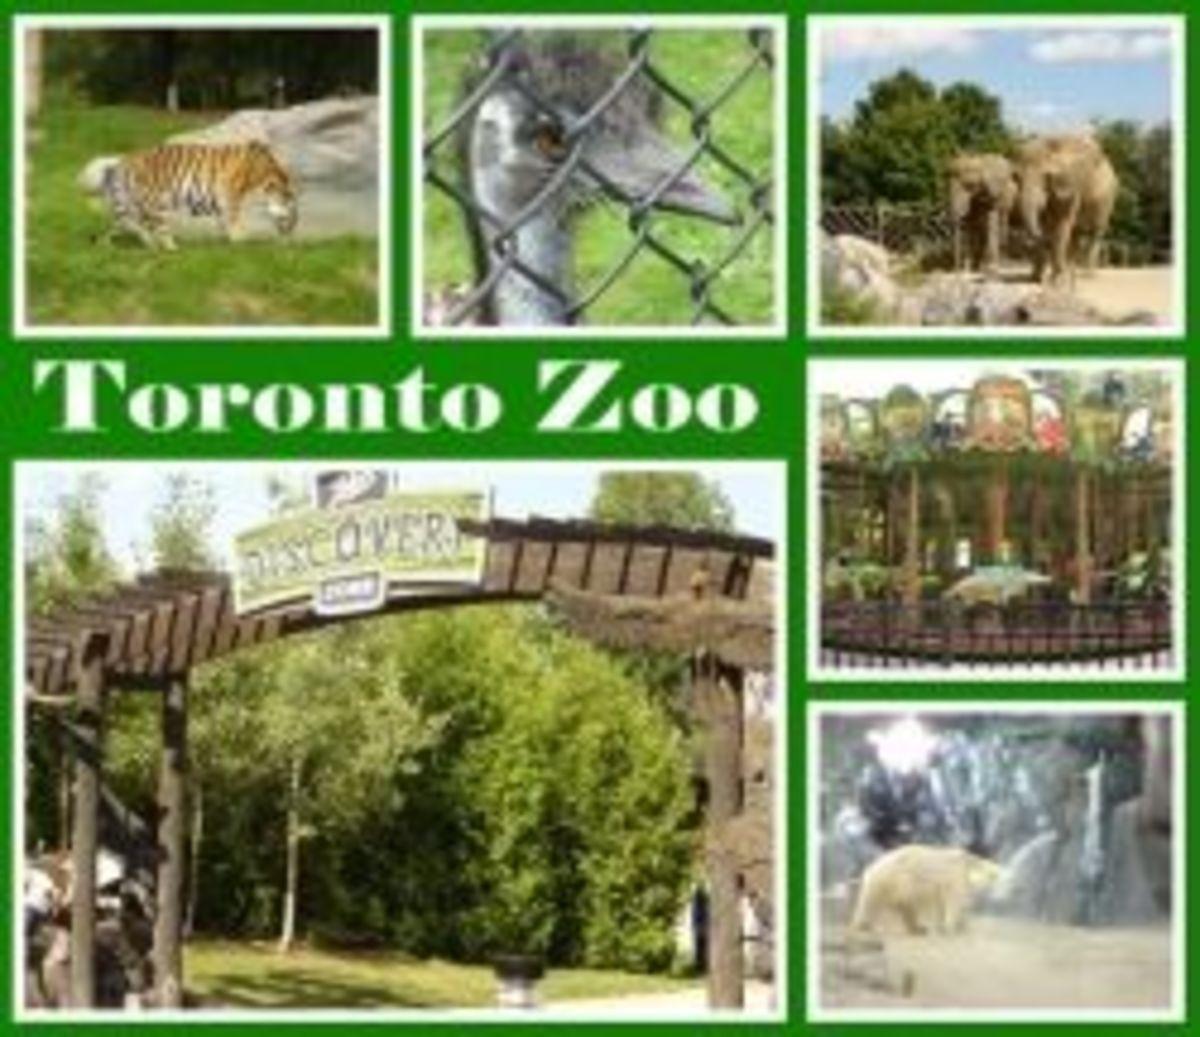 Toronto Zoo Canada